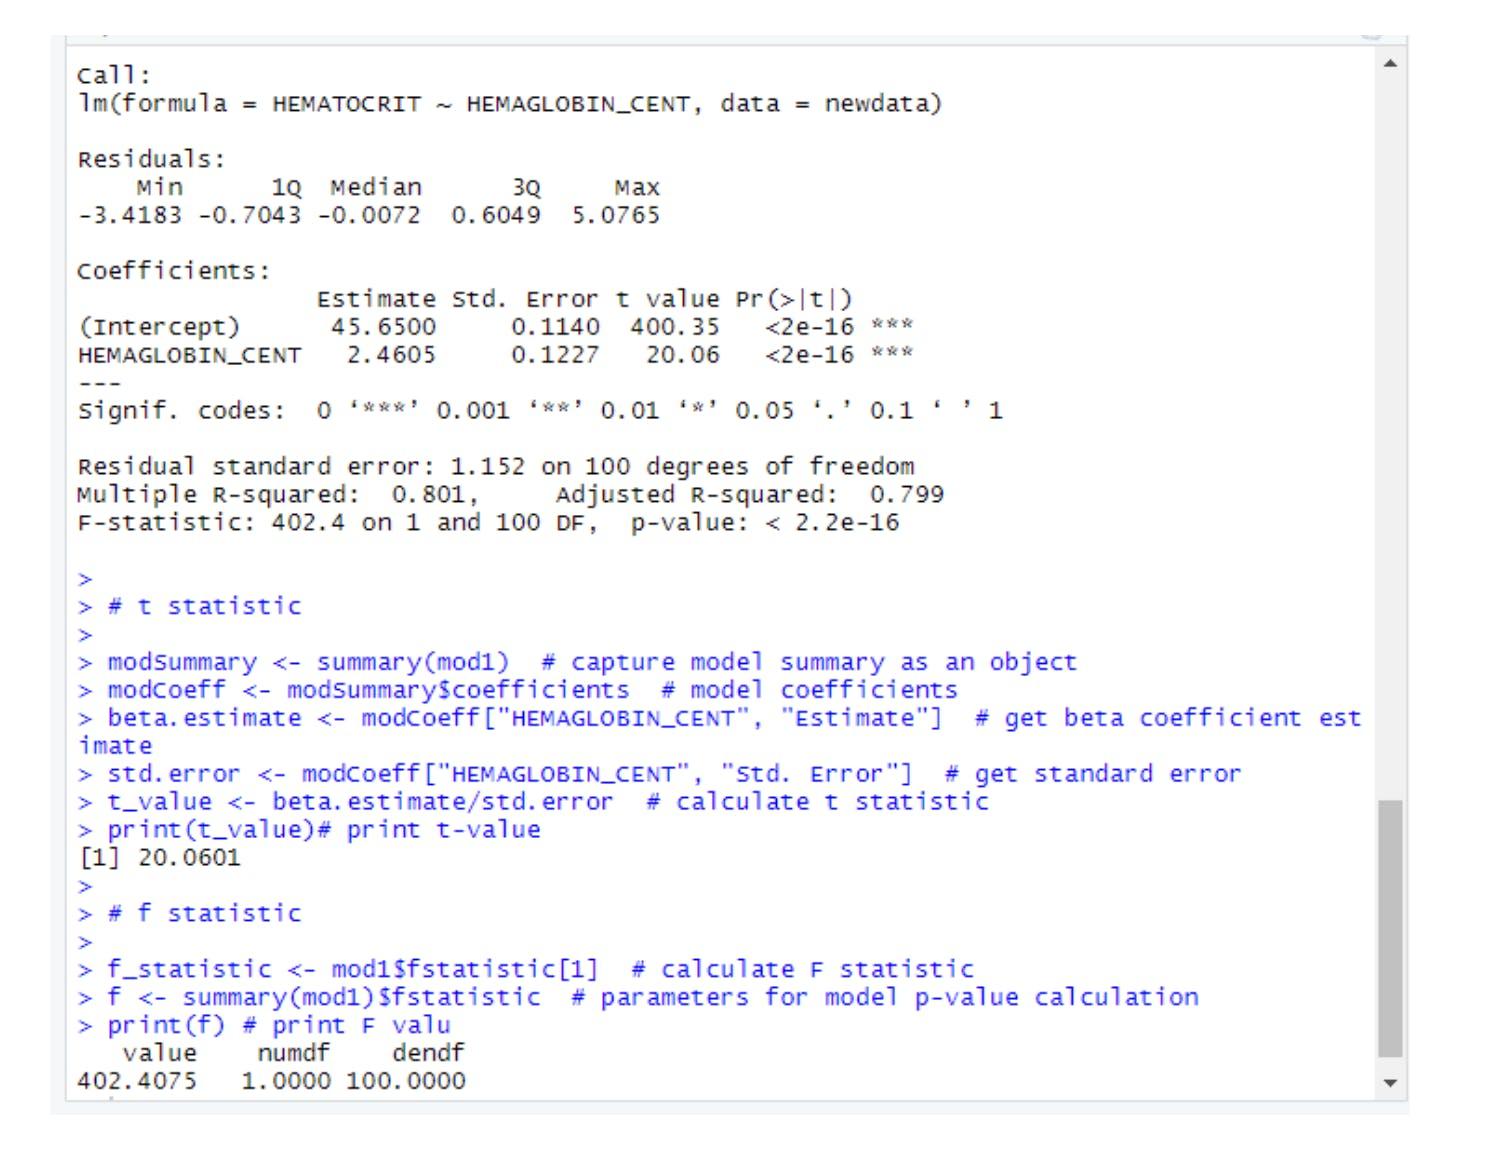 Screenshot 2021-05-18 at 5.18.51 PM.png